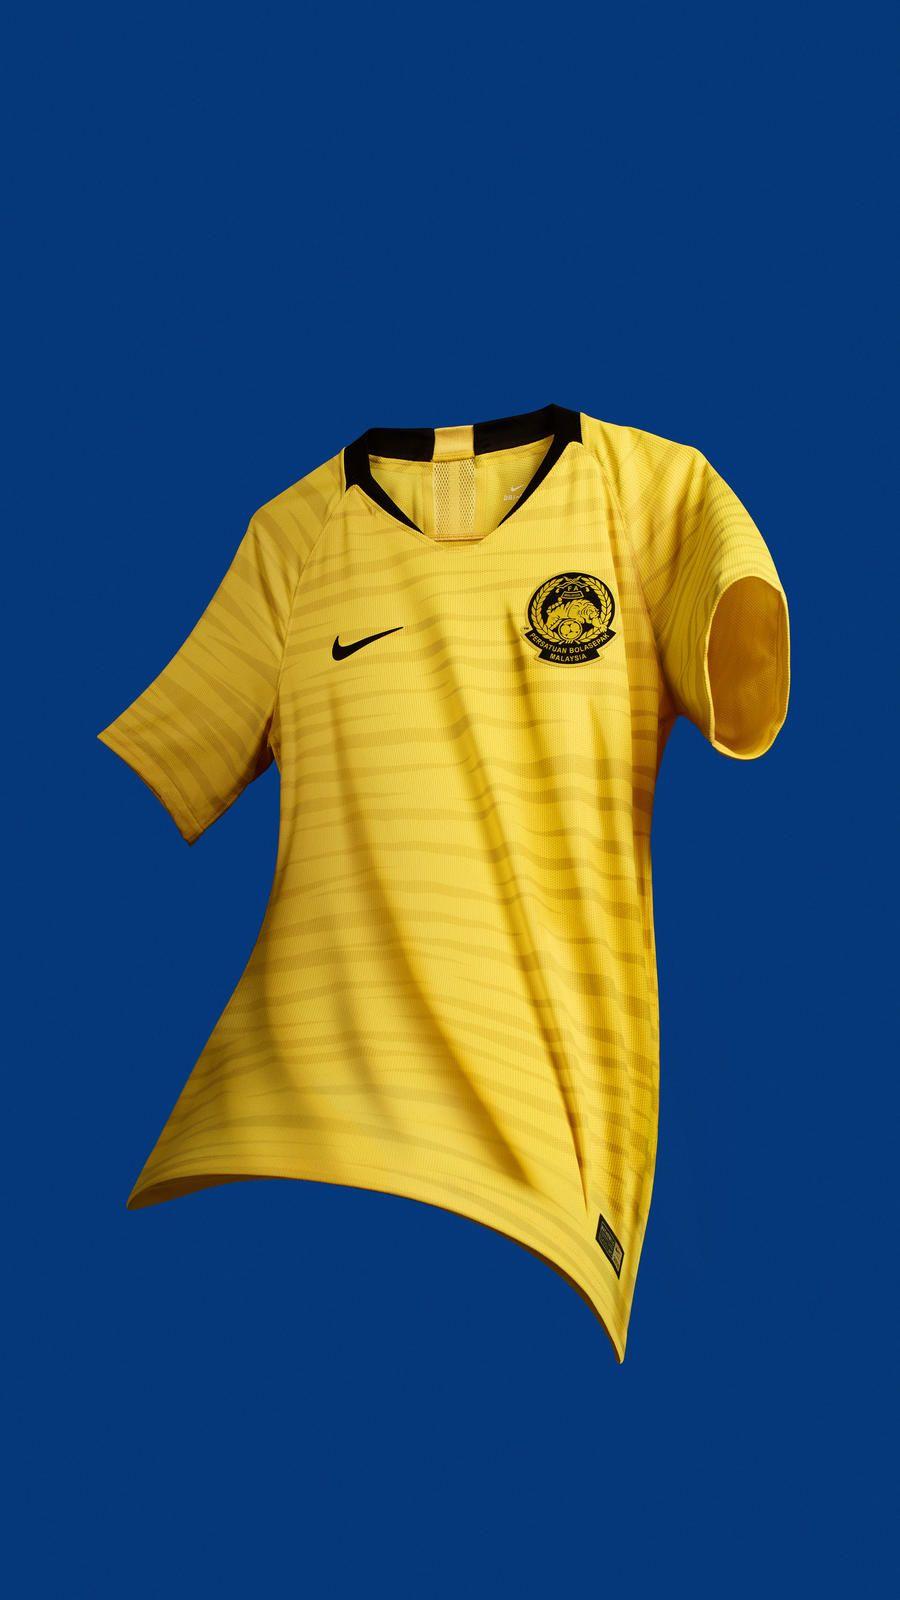 2018 Malaysia National Team Kit Sports Jersey Design Nike Football Malaysia National Football Team